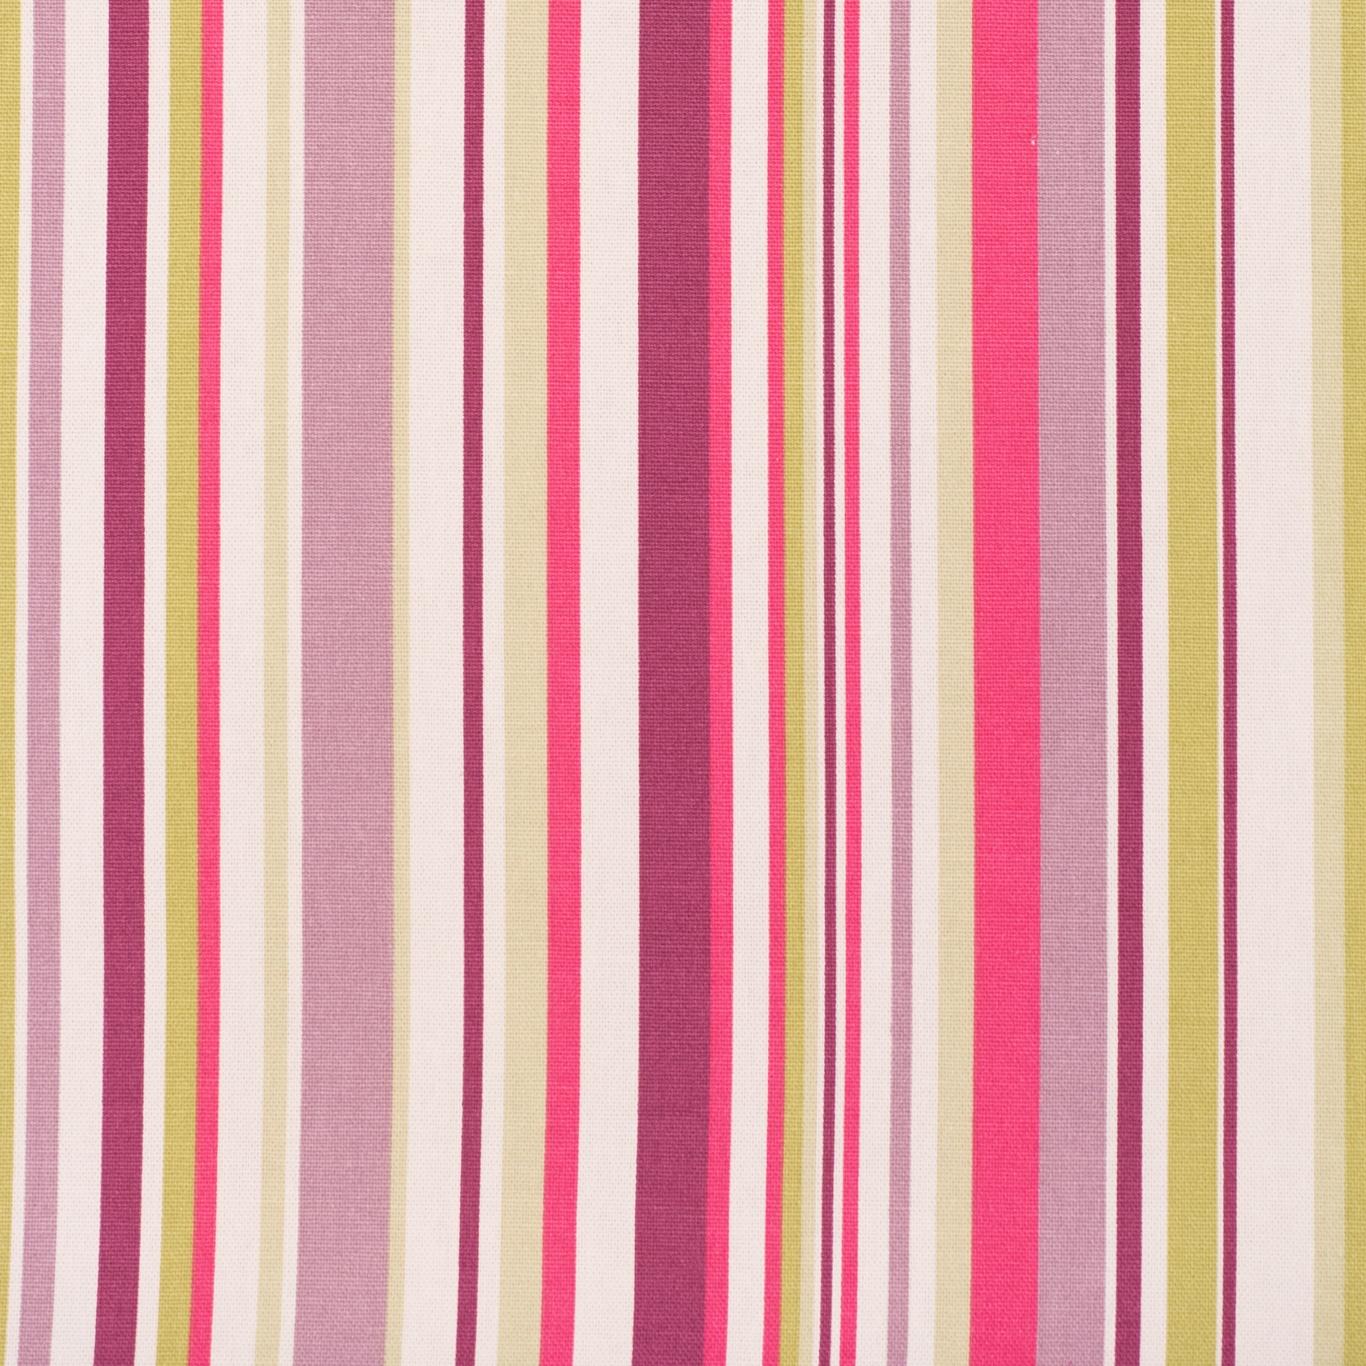 Image of Gordon Smith Funky Stripe Purple Fabric 3m Remnant